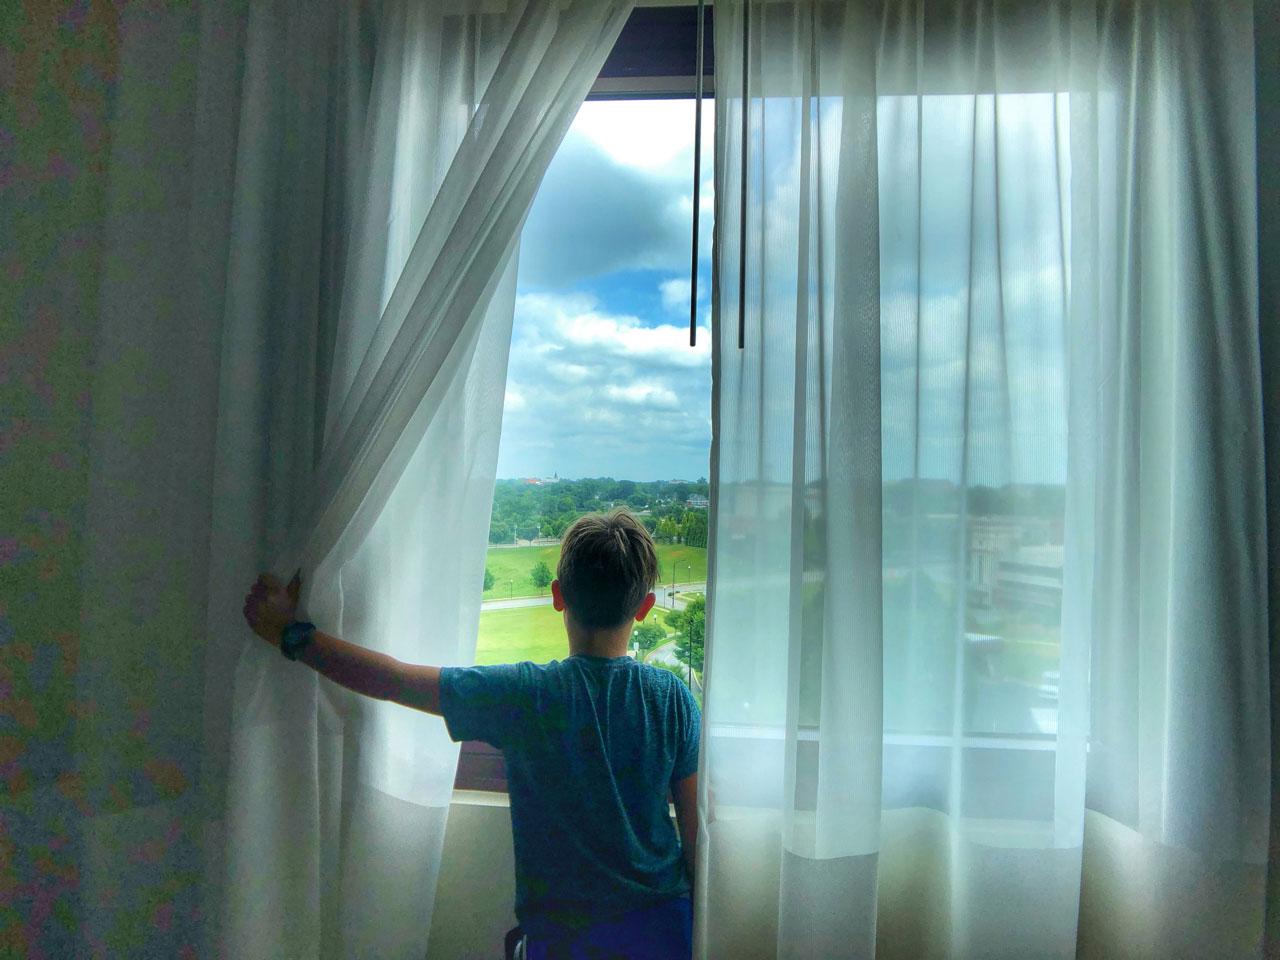 Spartanburg Marriott Getaway